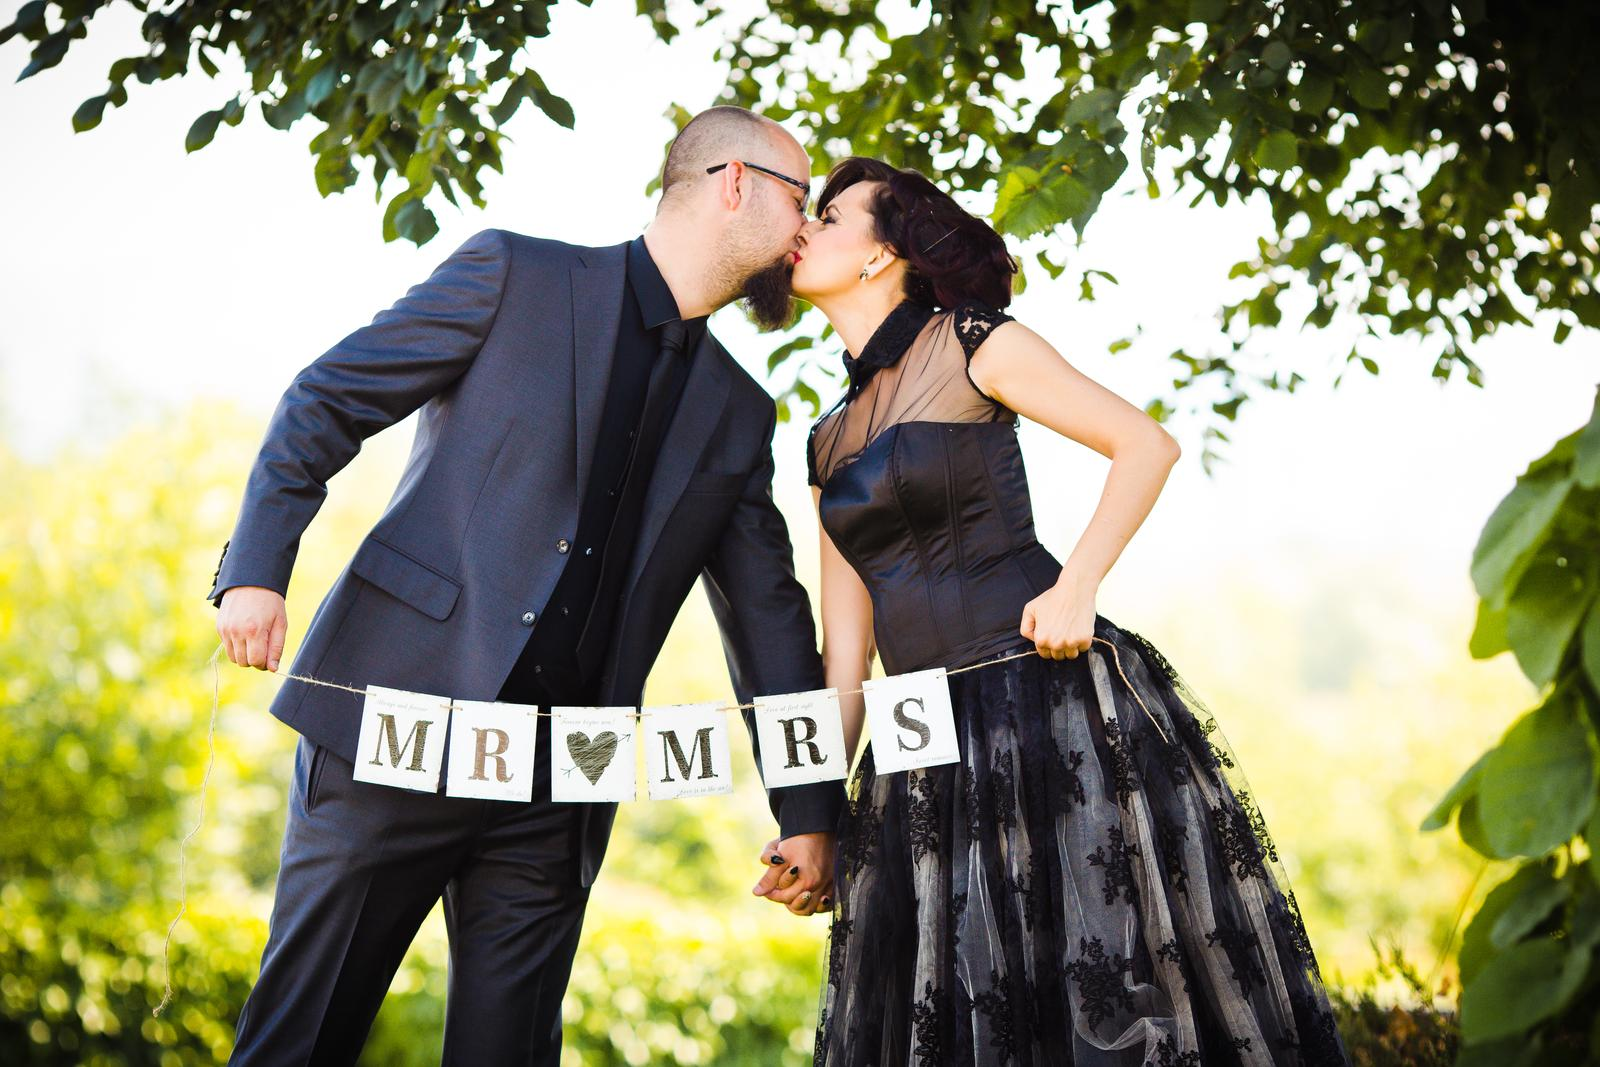 Girlanda Mr&Mrs - Obrázok č. 1